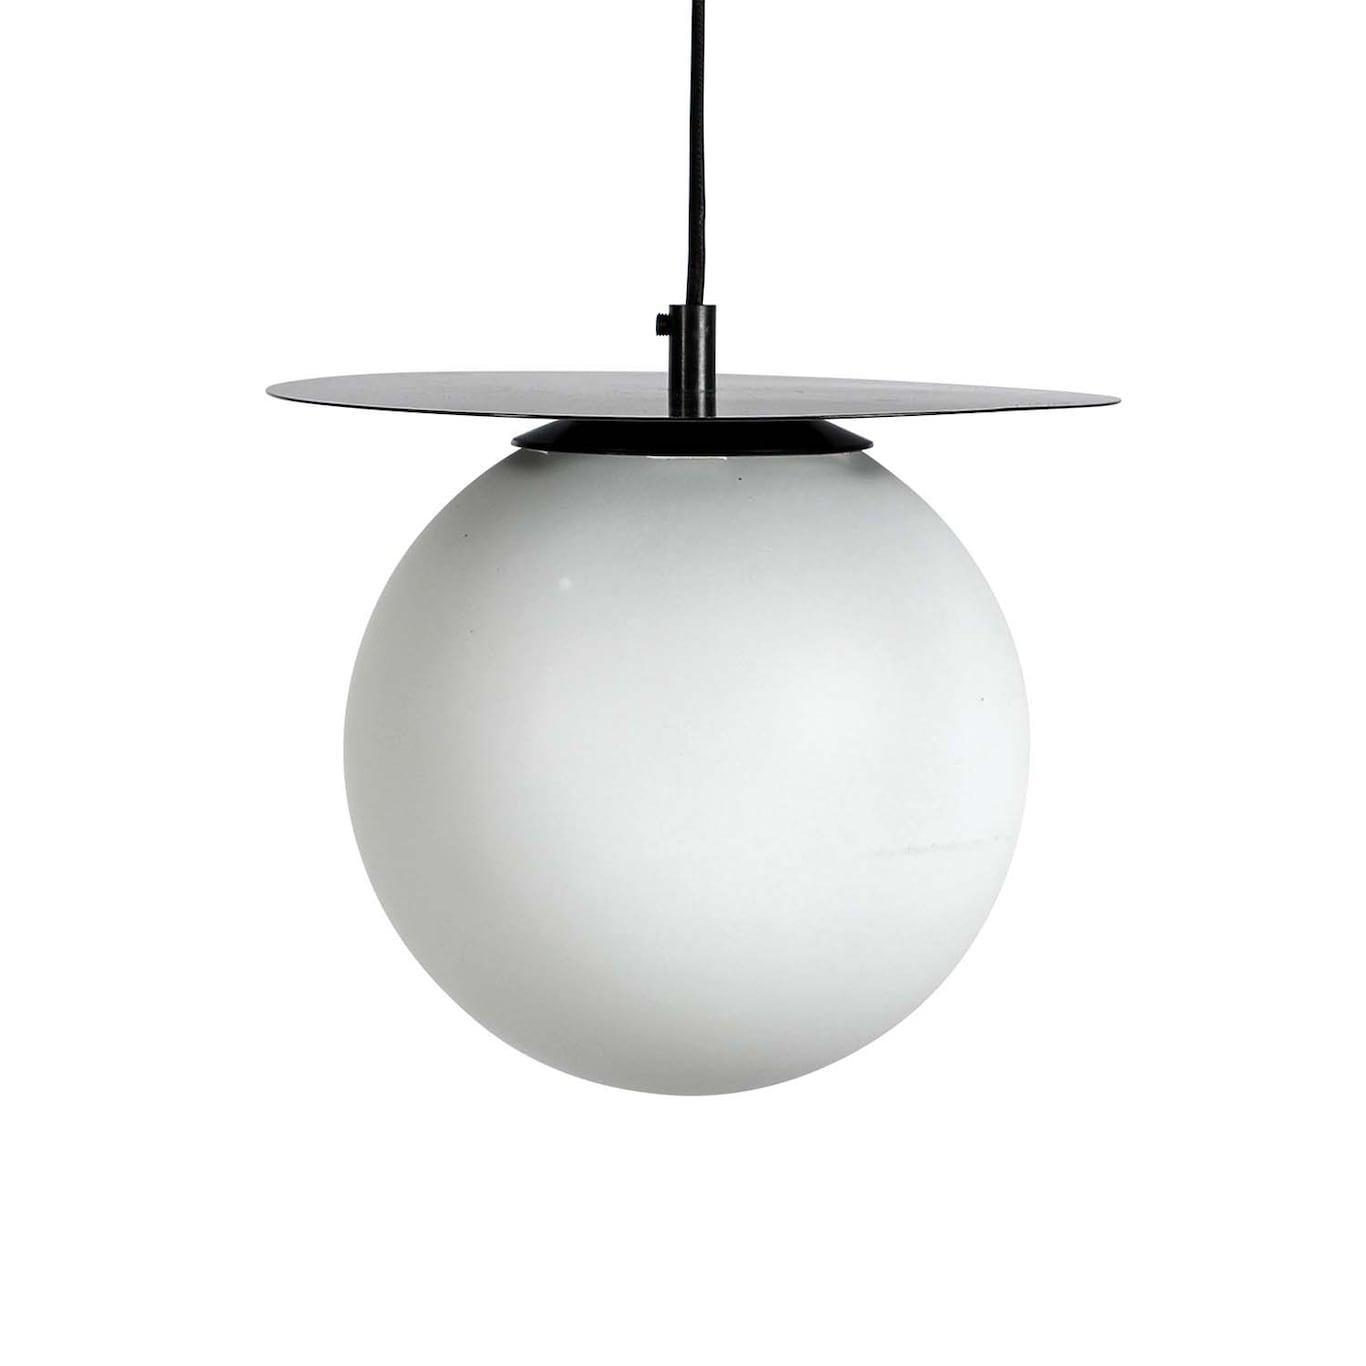 Lush Globe Taklampa 27x22 cm, Svart